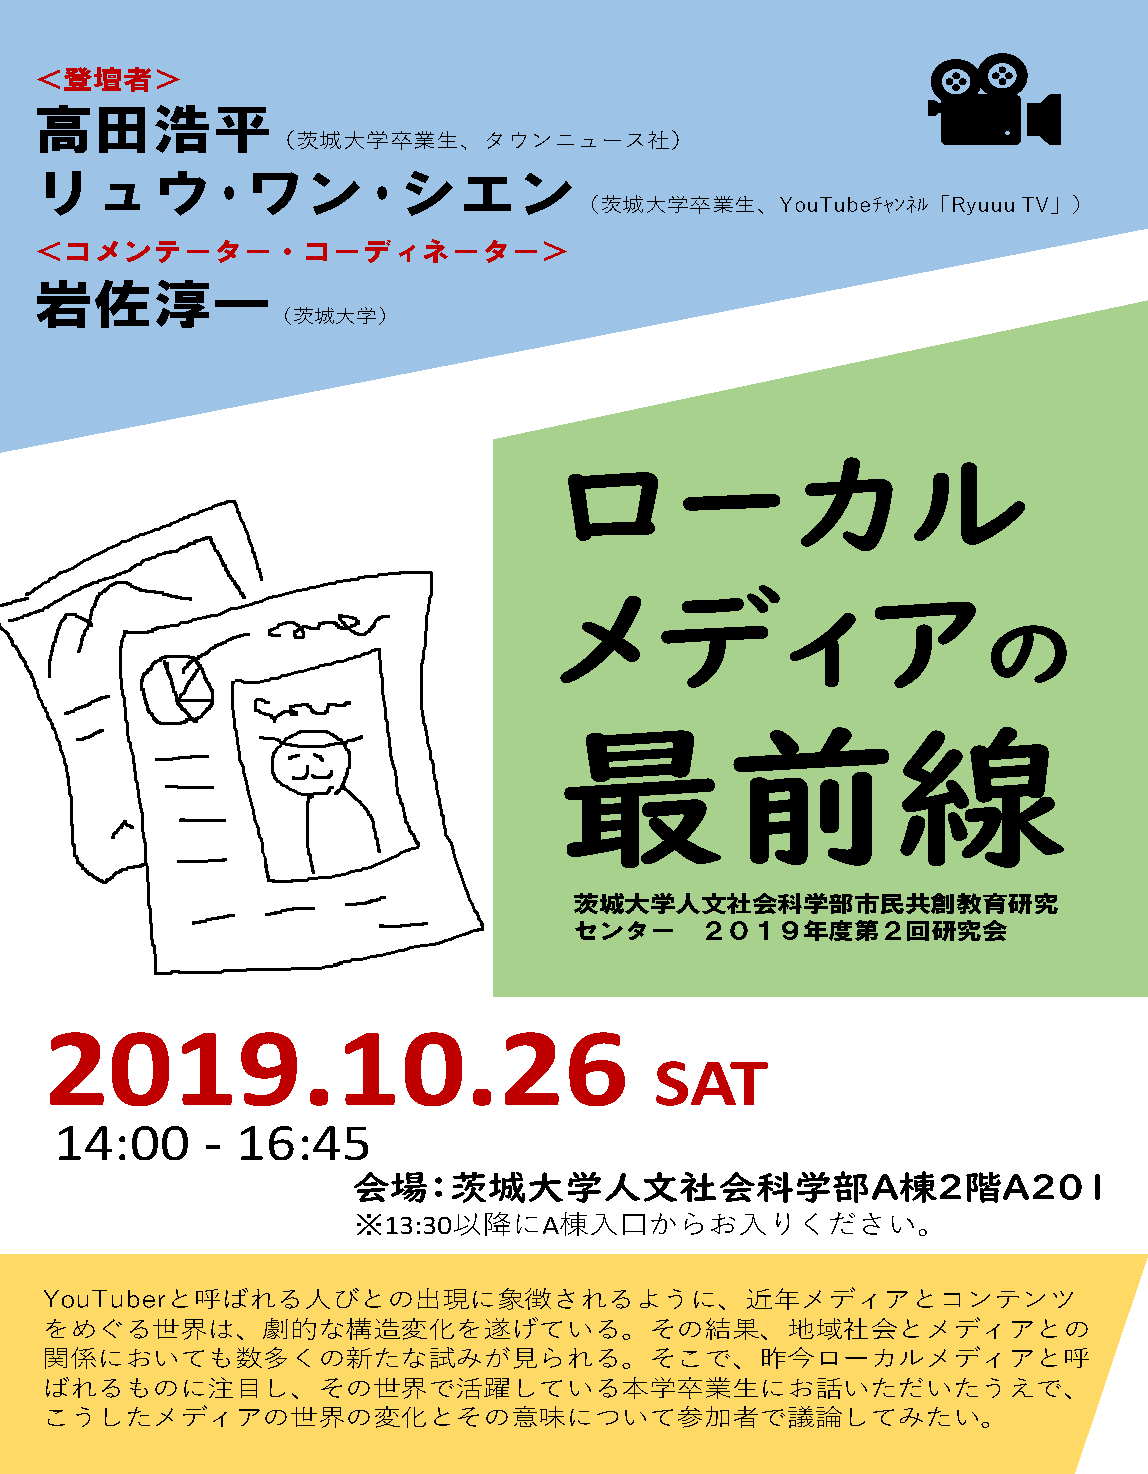 kyousou_kenkyukai2_191026.png